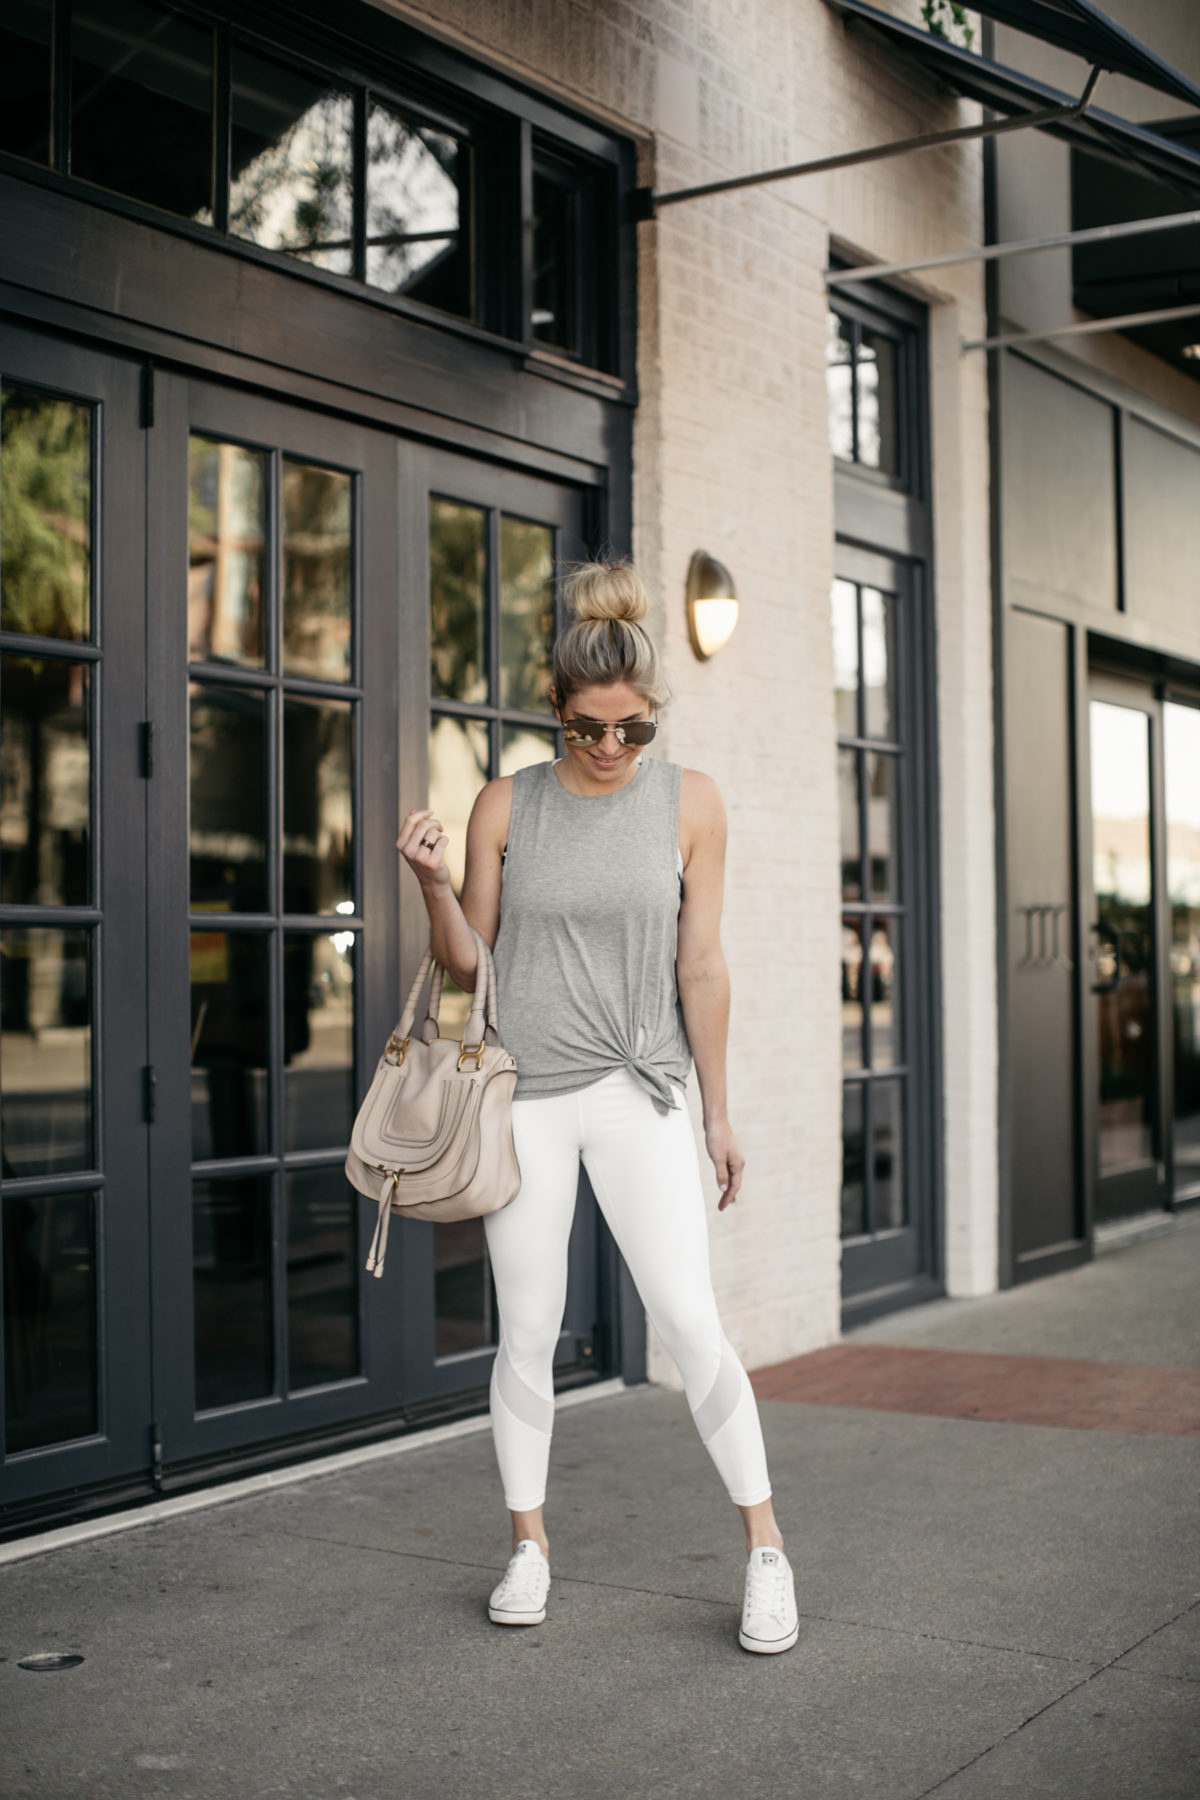 trendy white mesh leggings worn with racerback tank